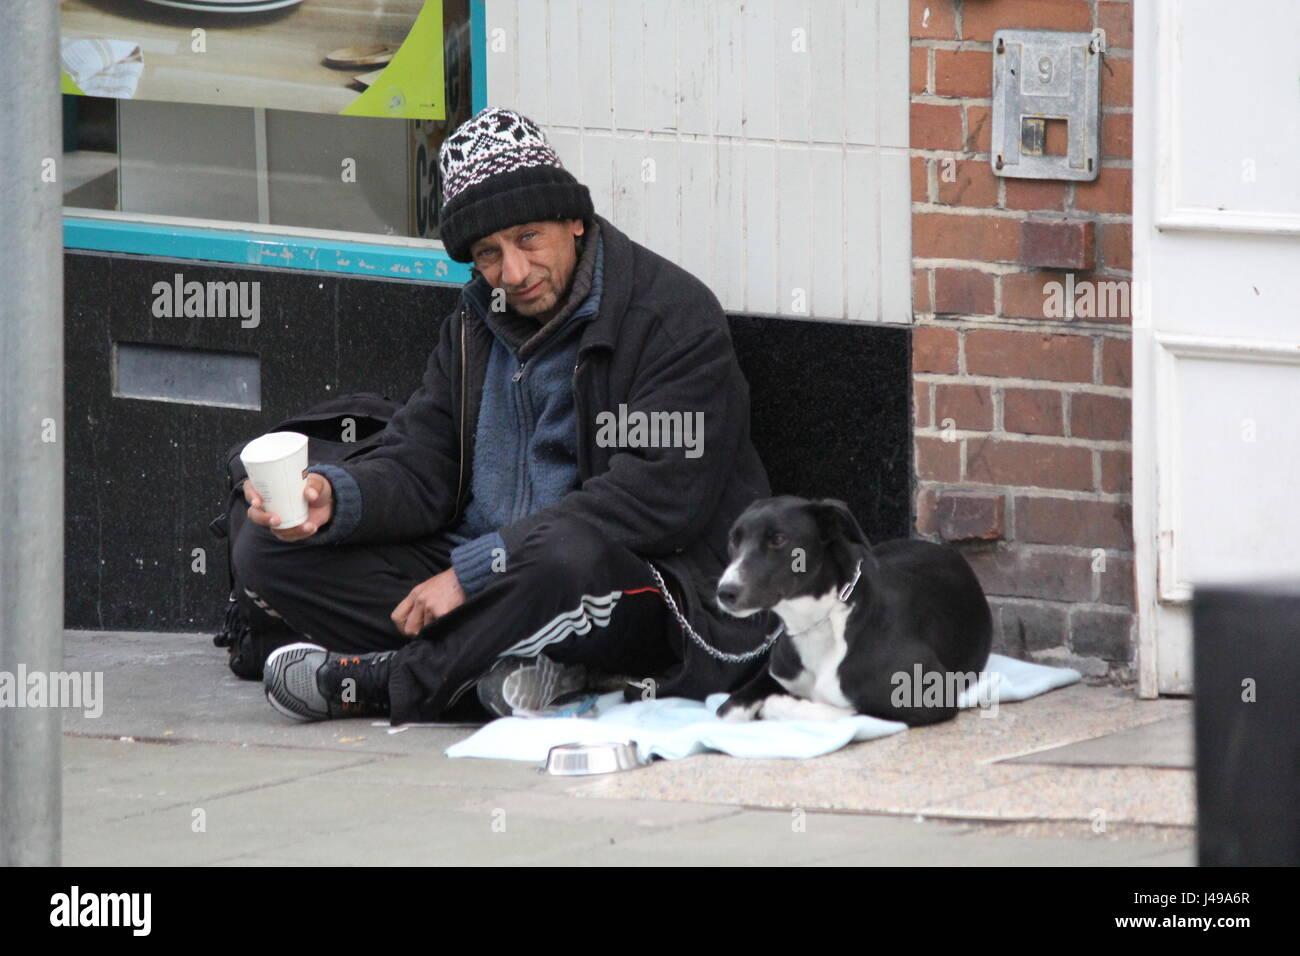 Romanian Beggars Stock Photos & Romanian Beggars Stock